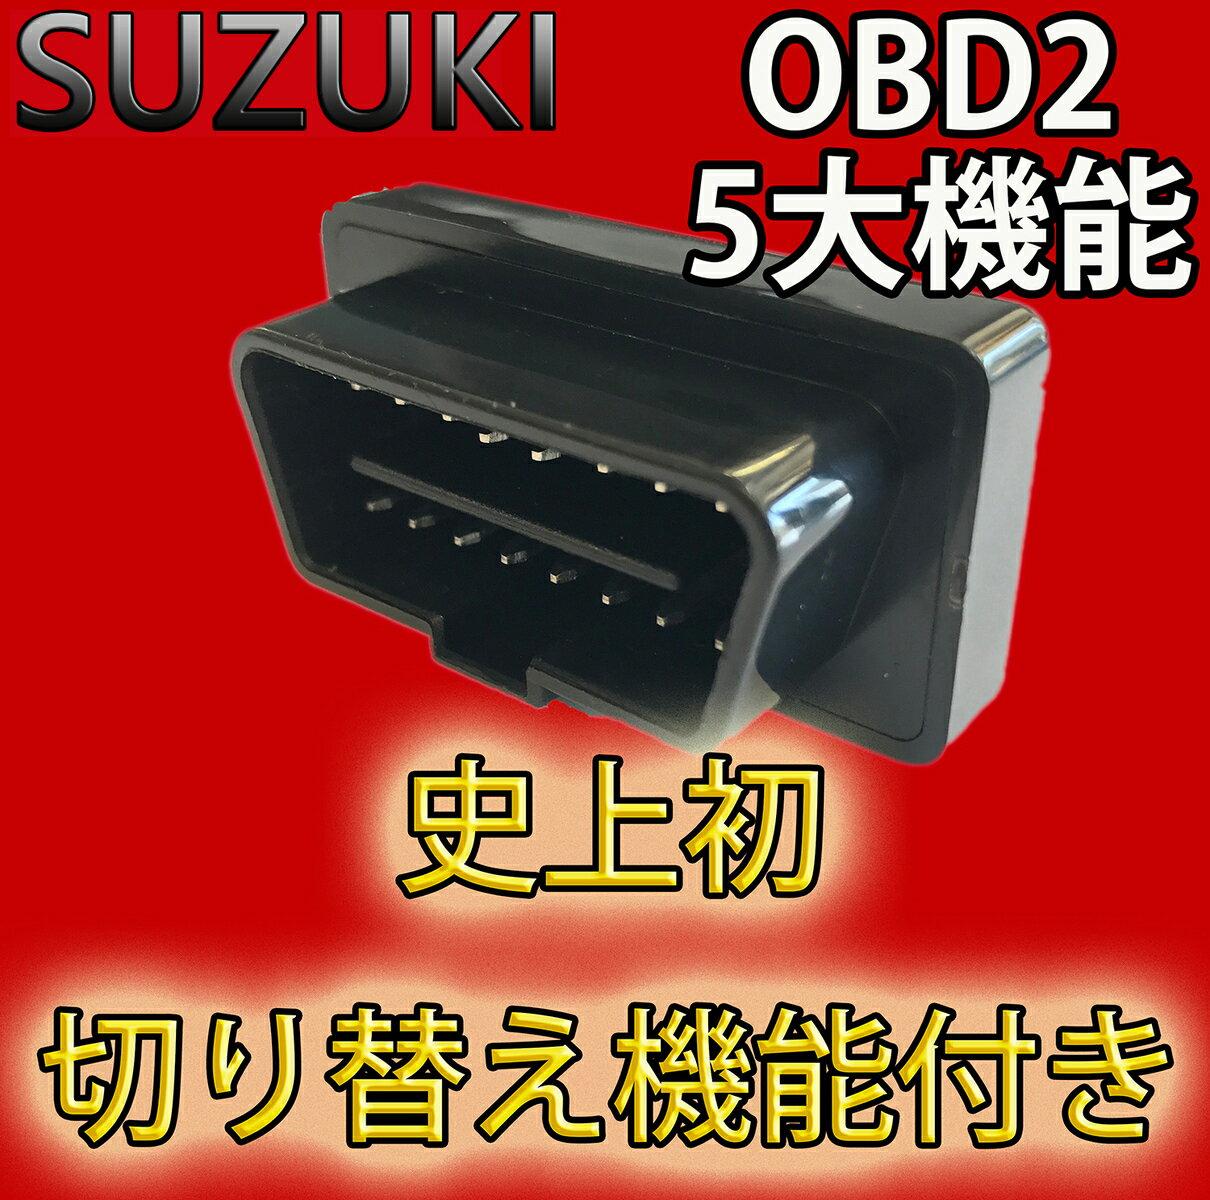 OBD2 車速連動ドアロック パーキングでロック解除 ハザード切り替え機能付き!スズキ ハスラー DAA-MR41S ソリオ DBA-MA15S 等